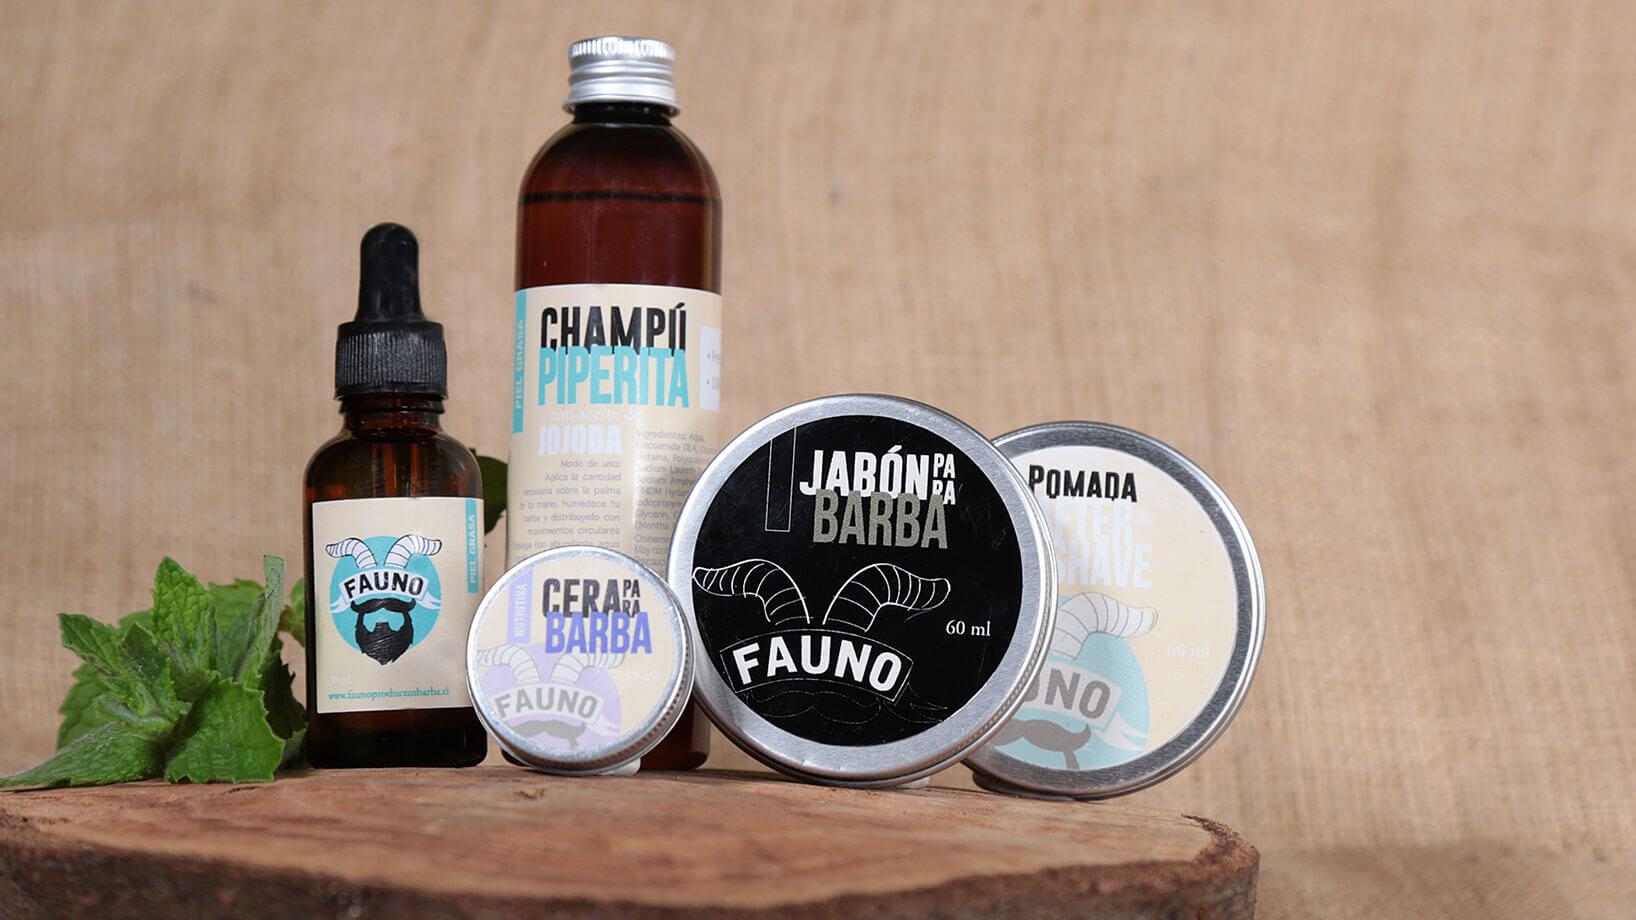 Productos para Barberia Fauno sesión de fotografias de productos de catálogo